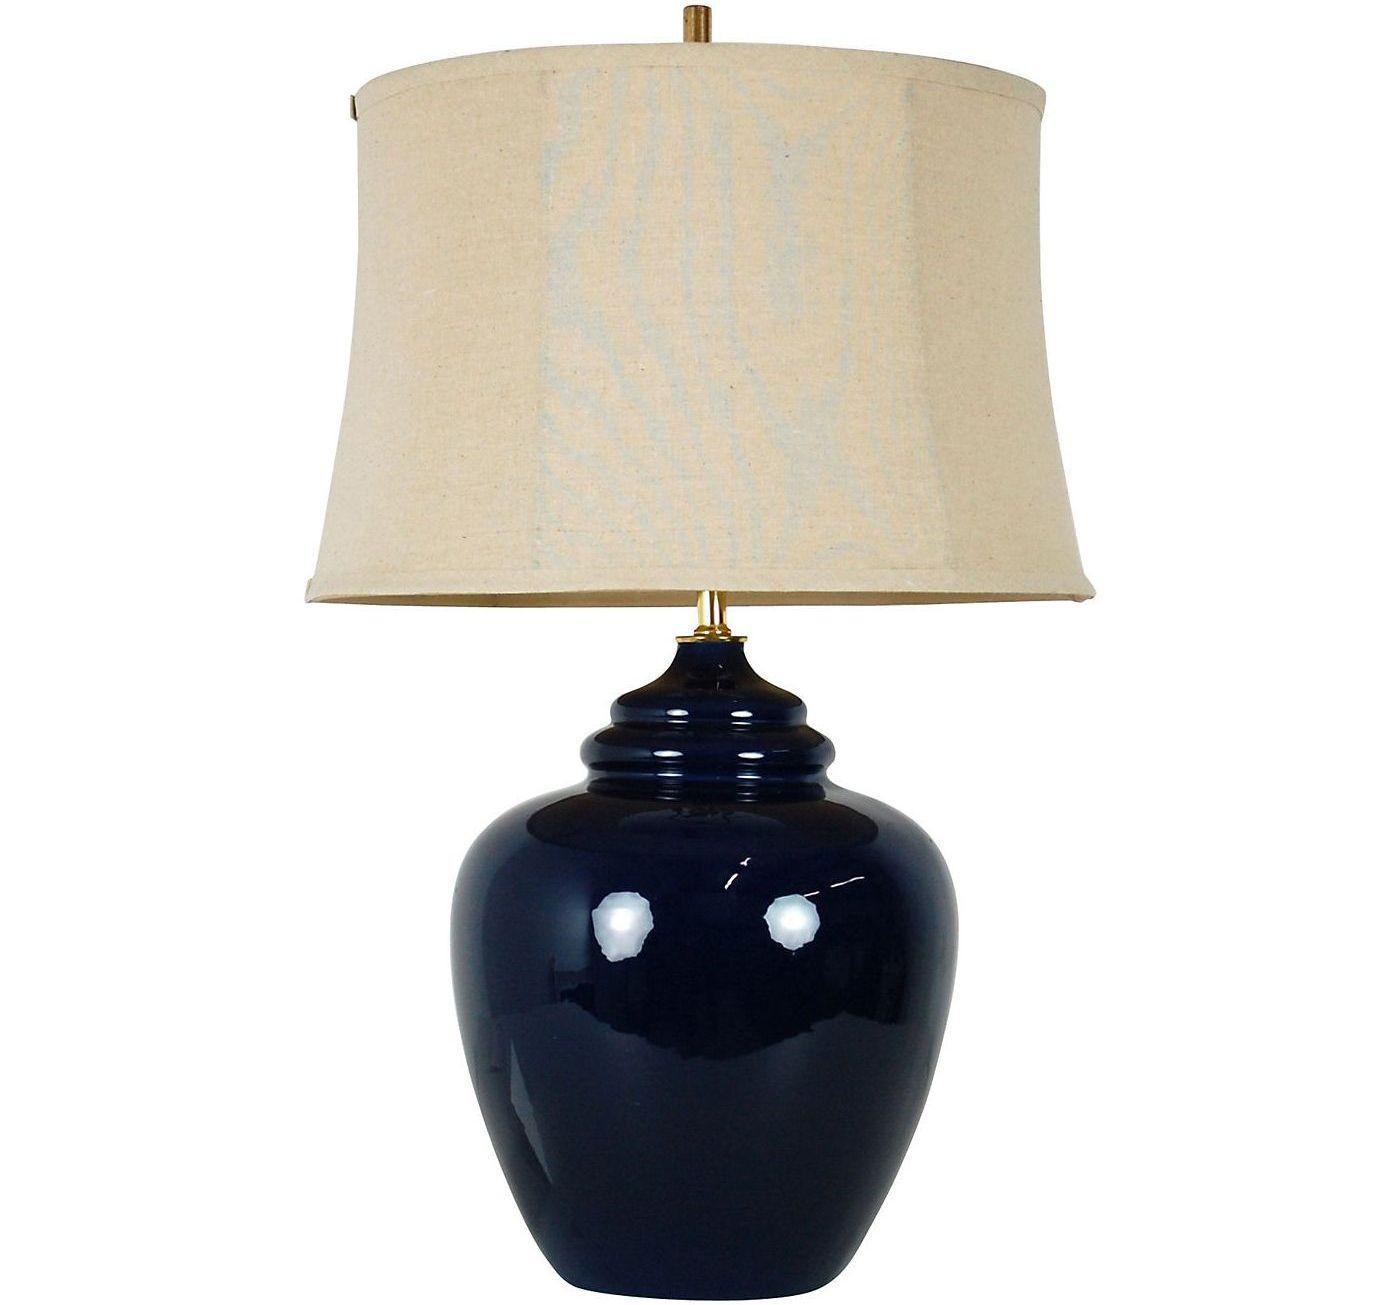 Large Vintage Navy Blue Ceramic Lamp Amp Shade Chairish